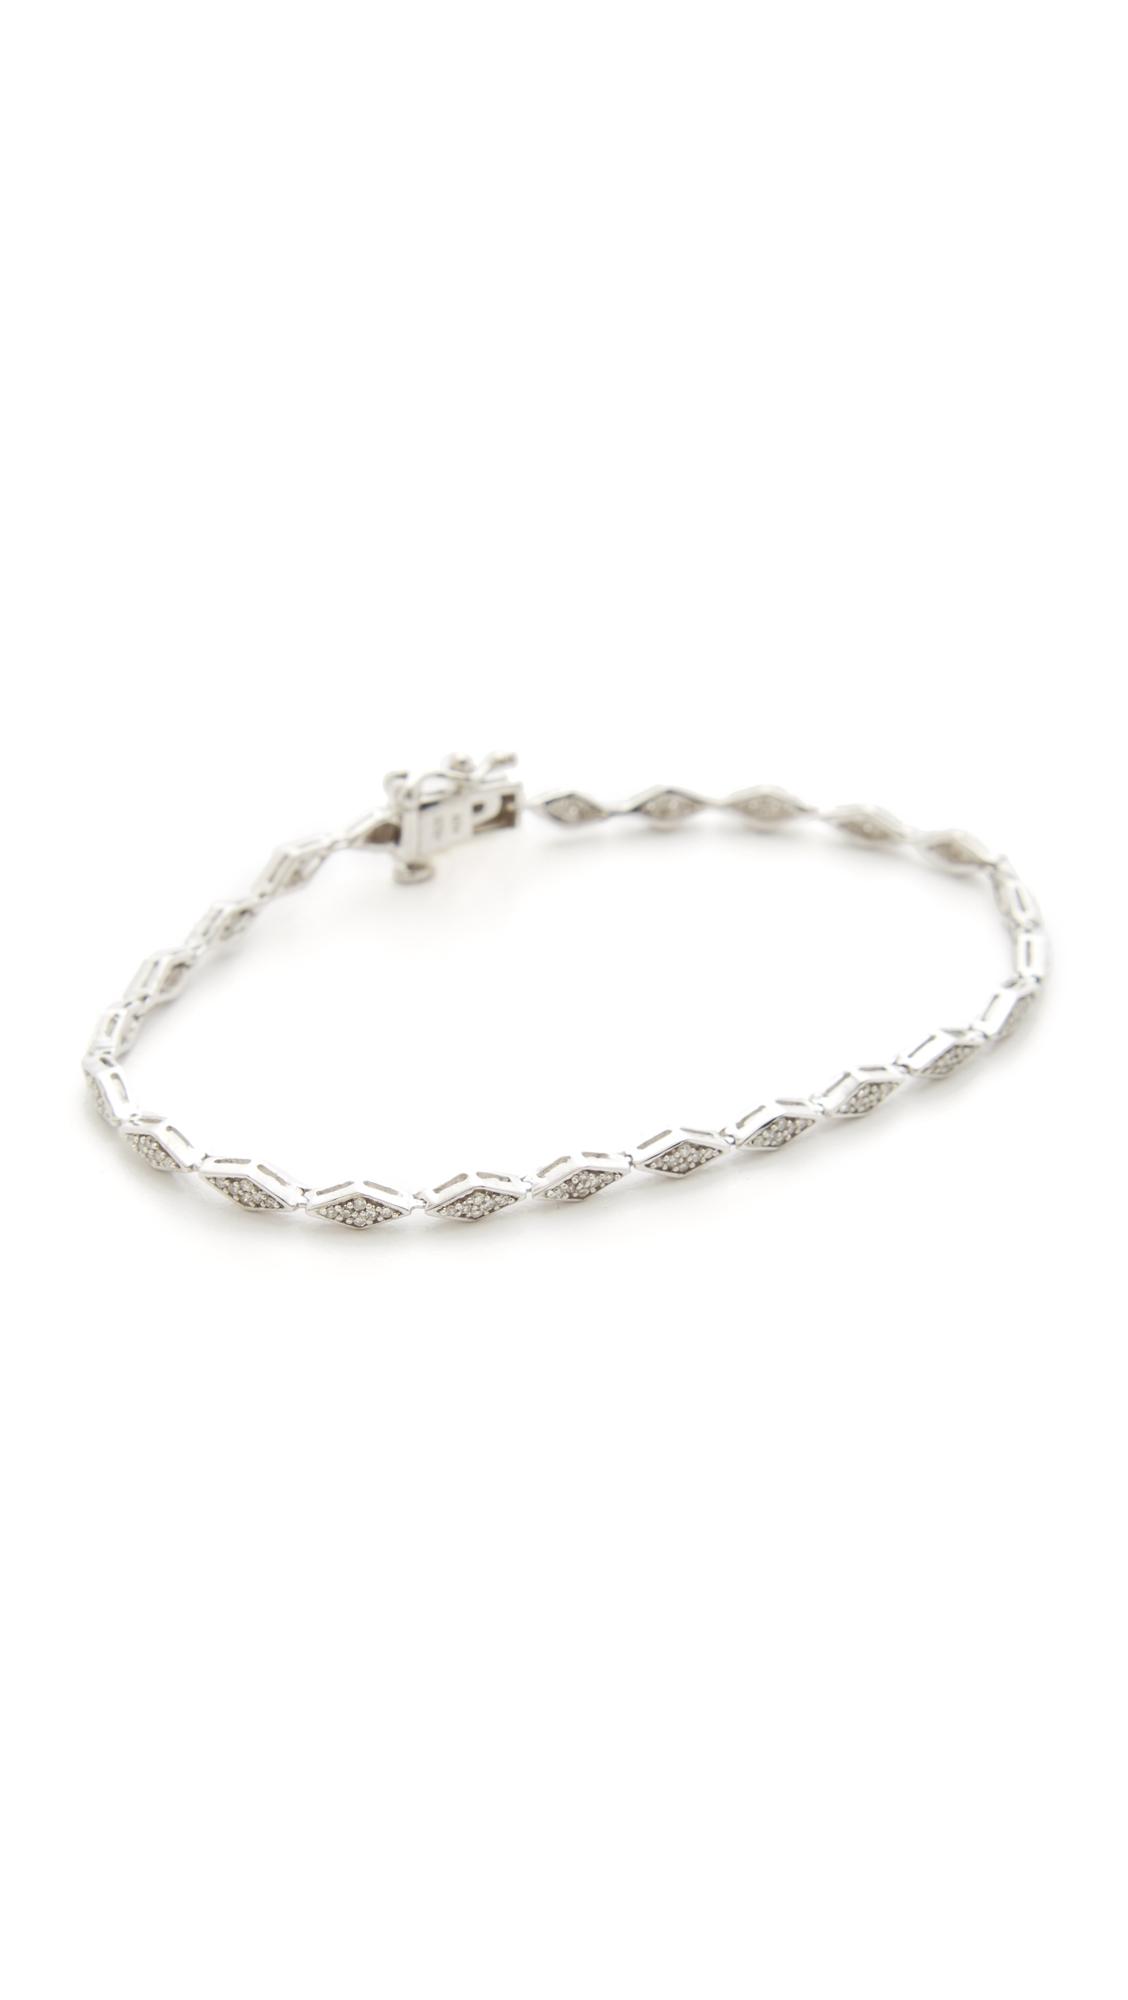 Adina Reyter Pave Diamond Tennis Bracelet - Silver